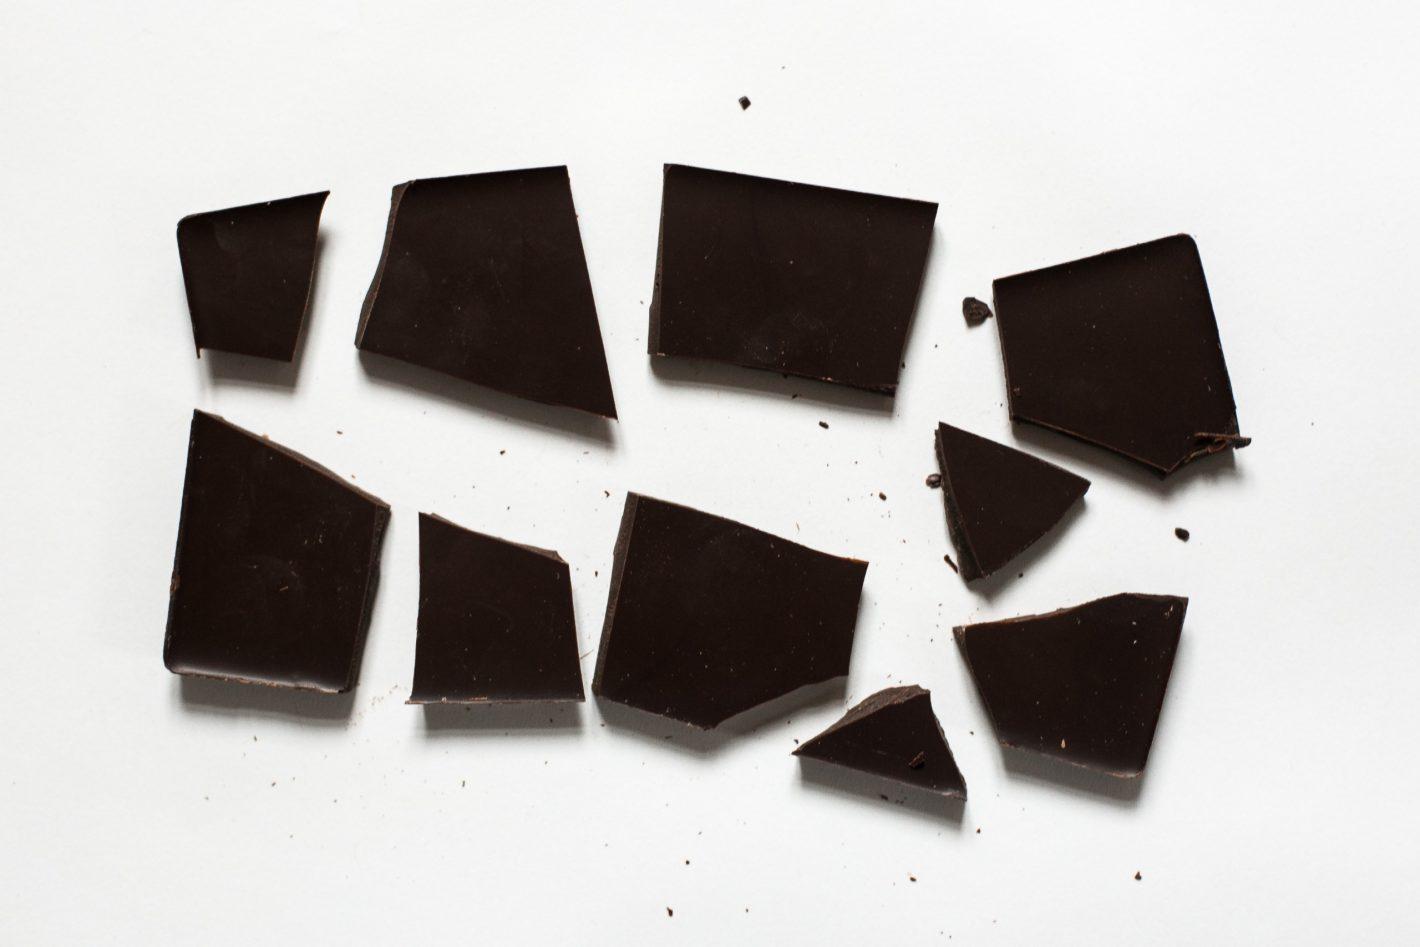 Tafel Schokolade in Stücken.